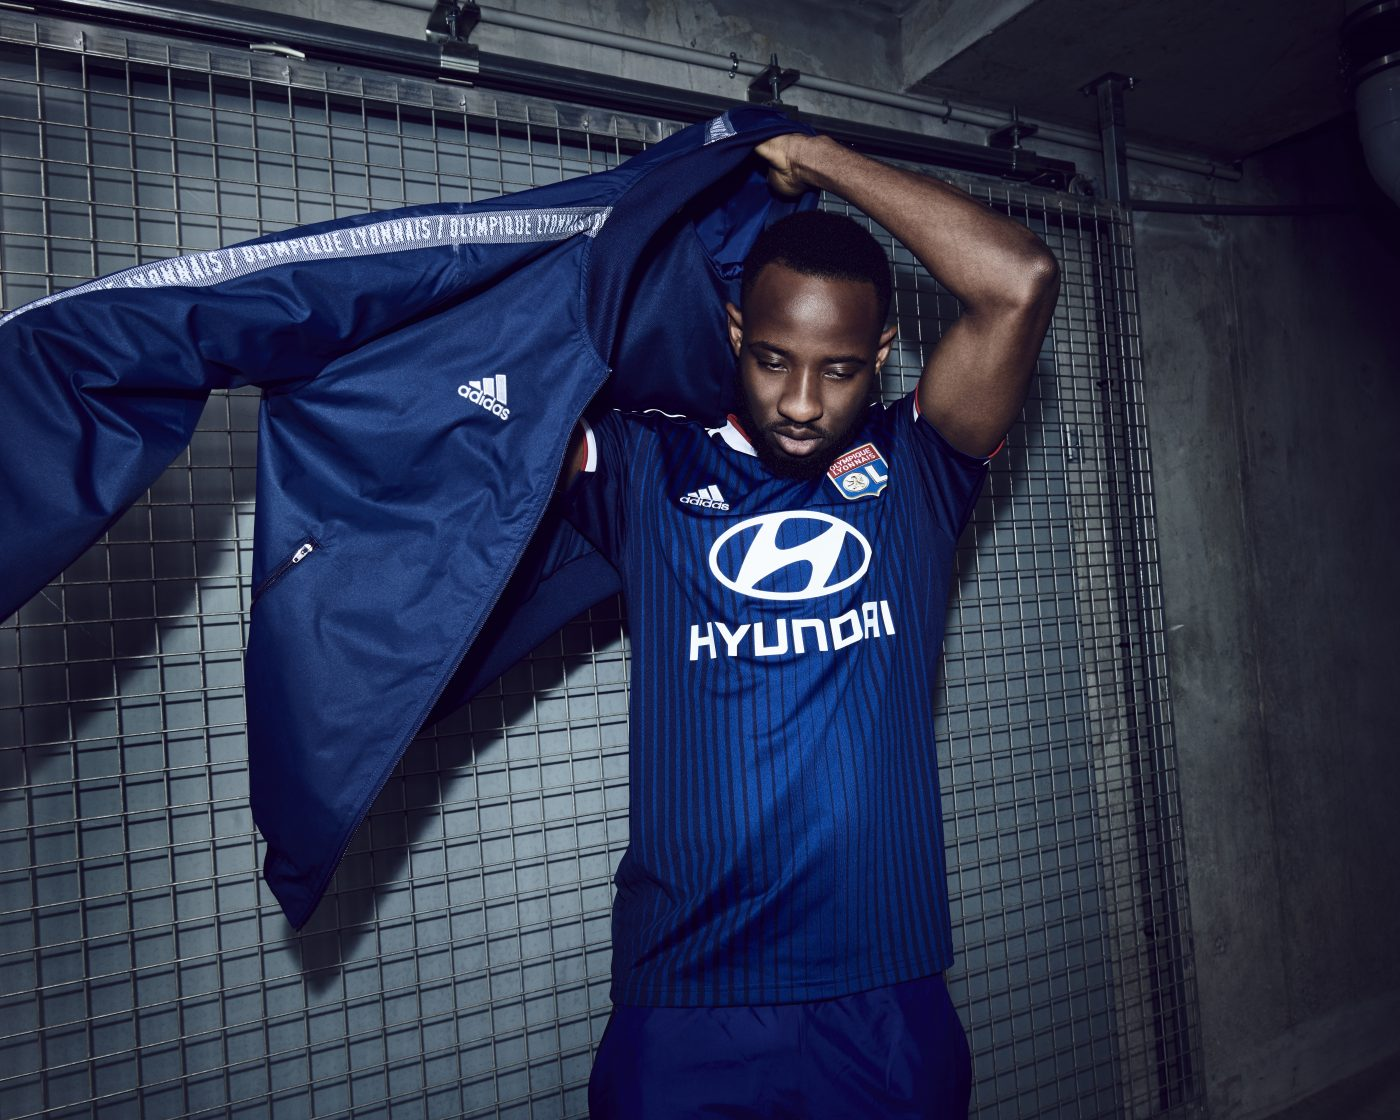 maillot-exterieur-olympique-lyonnais-ol-lyon-2019-2020-adidas-9